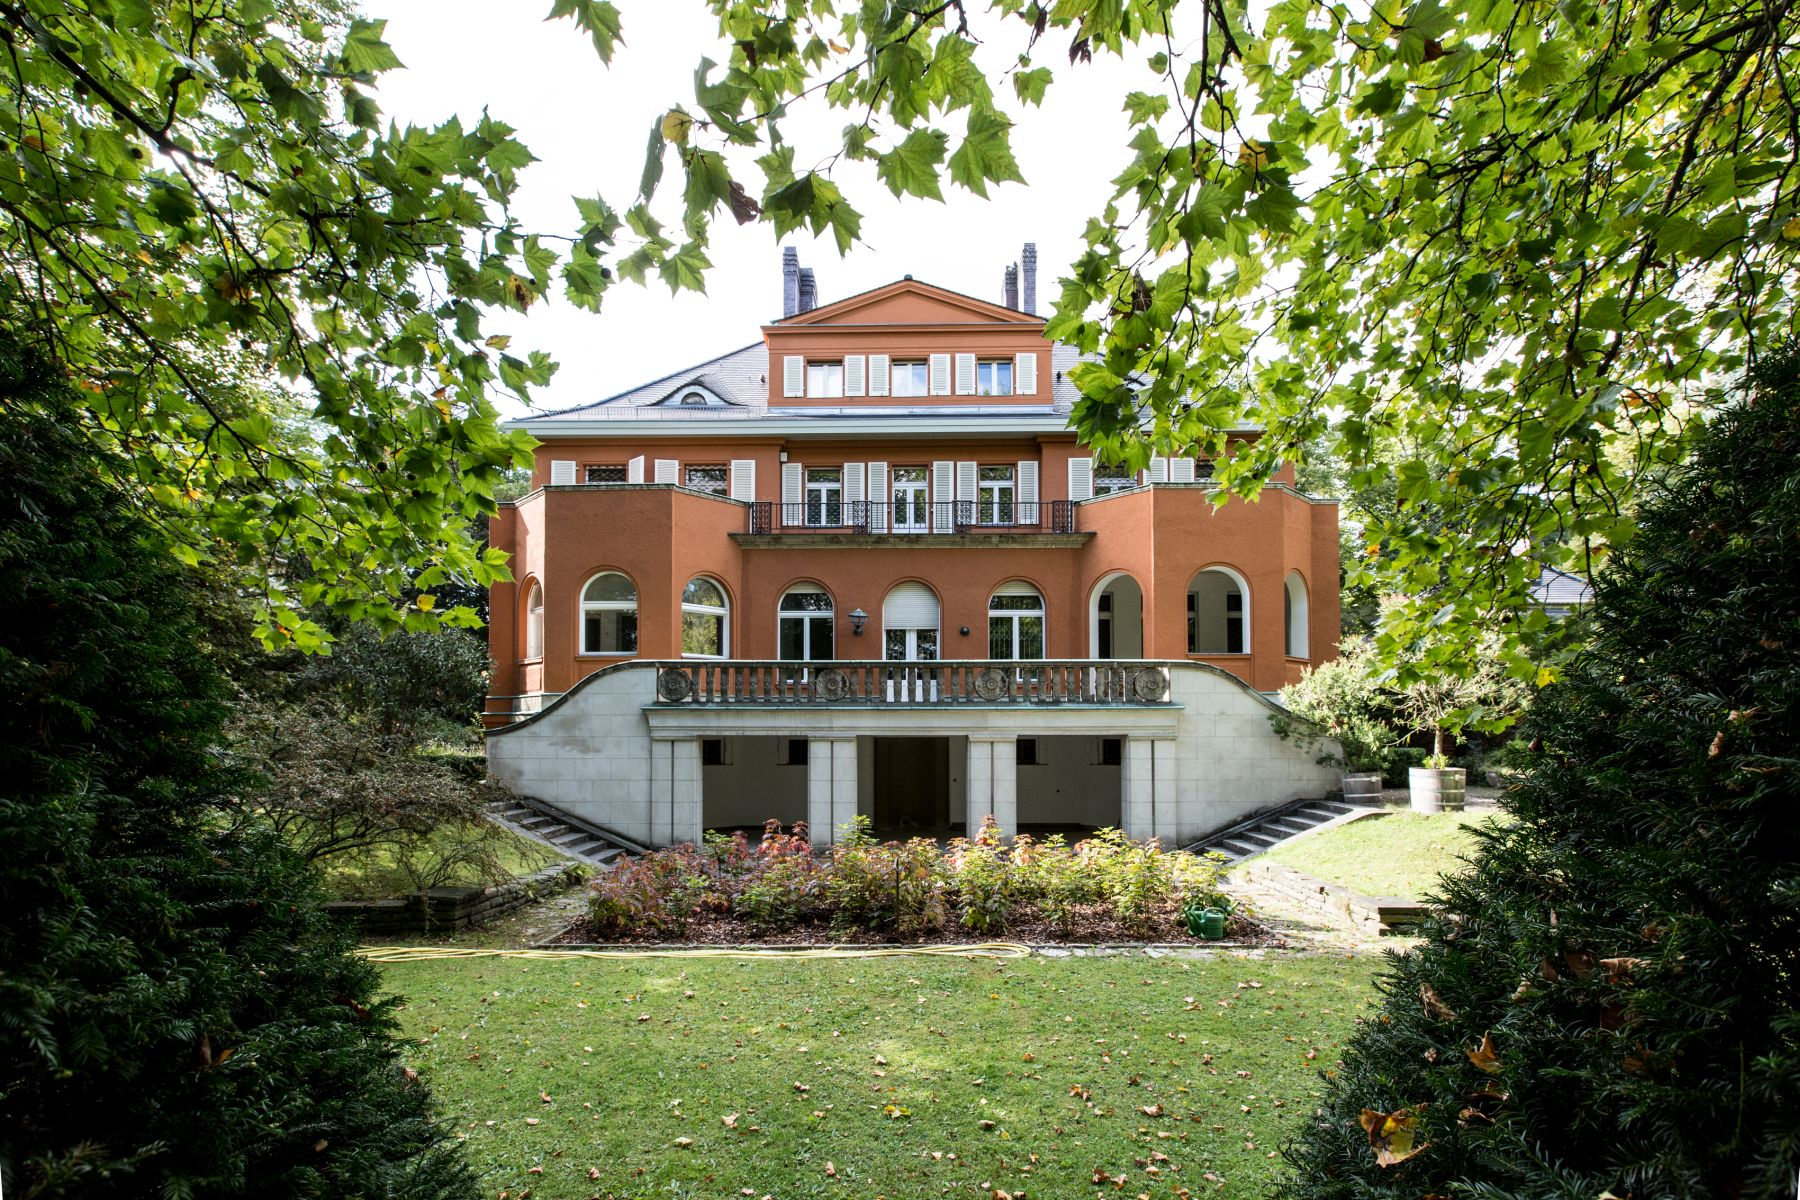 Casa para uma família para Venda às Magnificent, Historical Villa in an exclusive Location! Berlin, Berlim, 14195 Alemanha